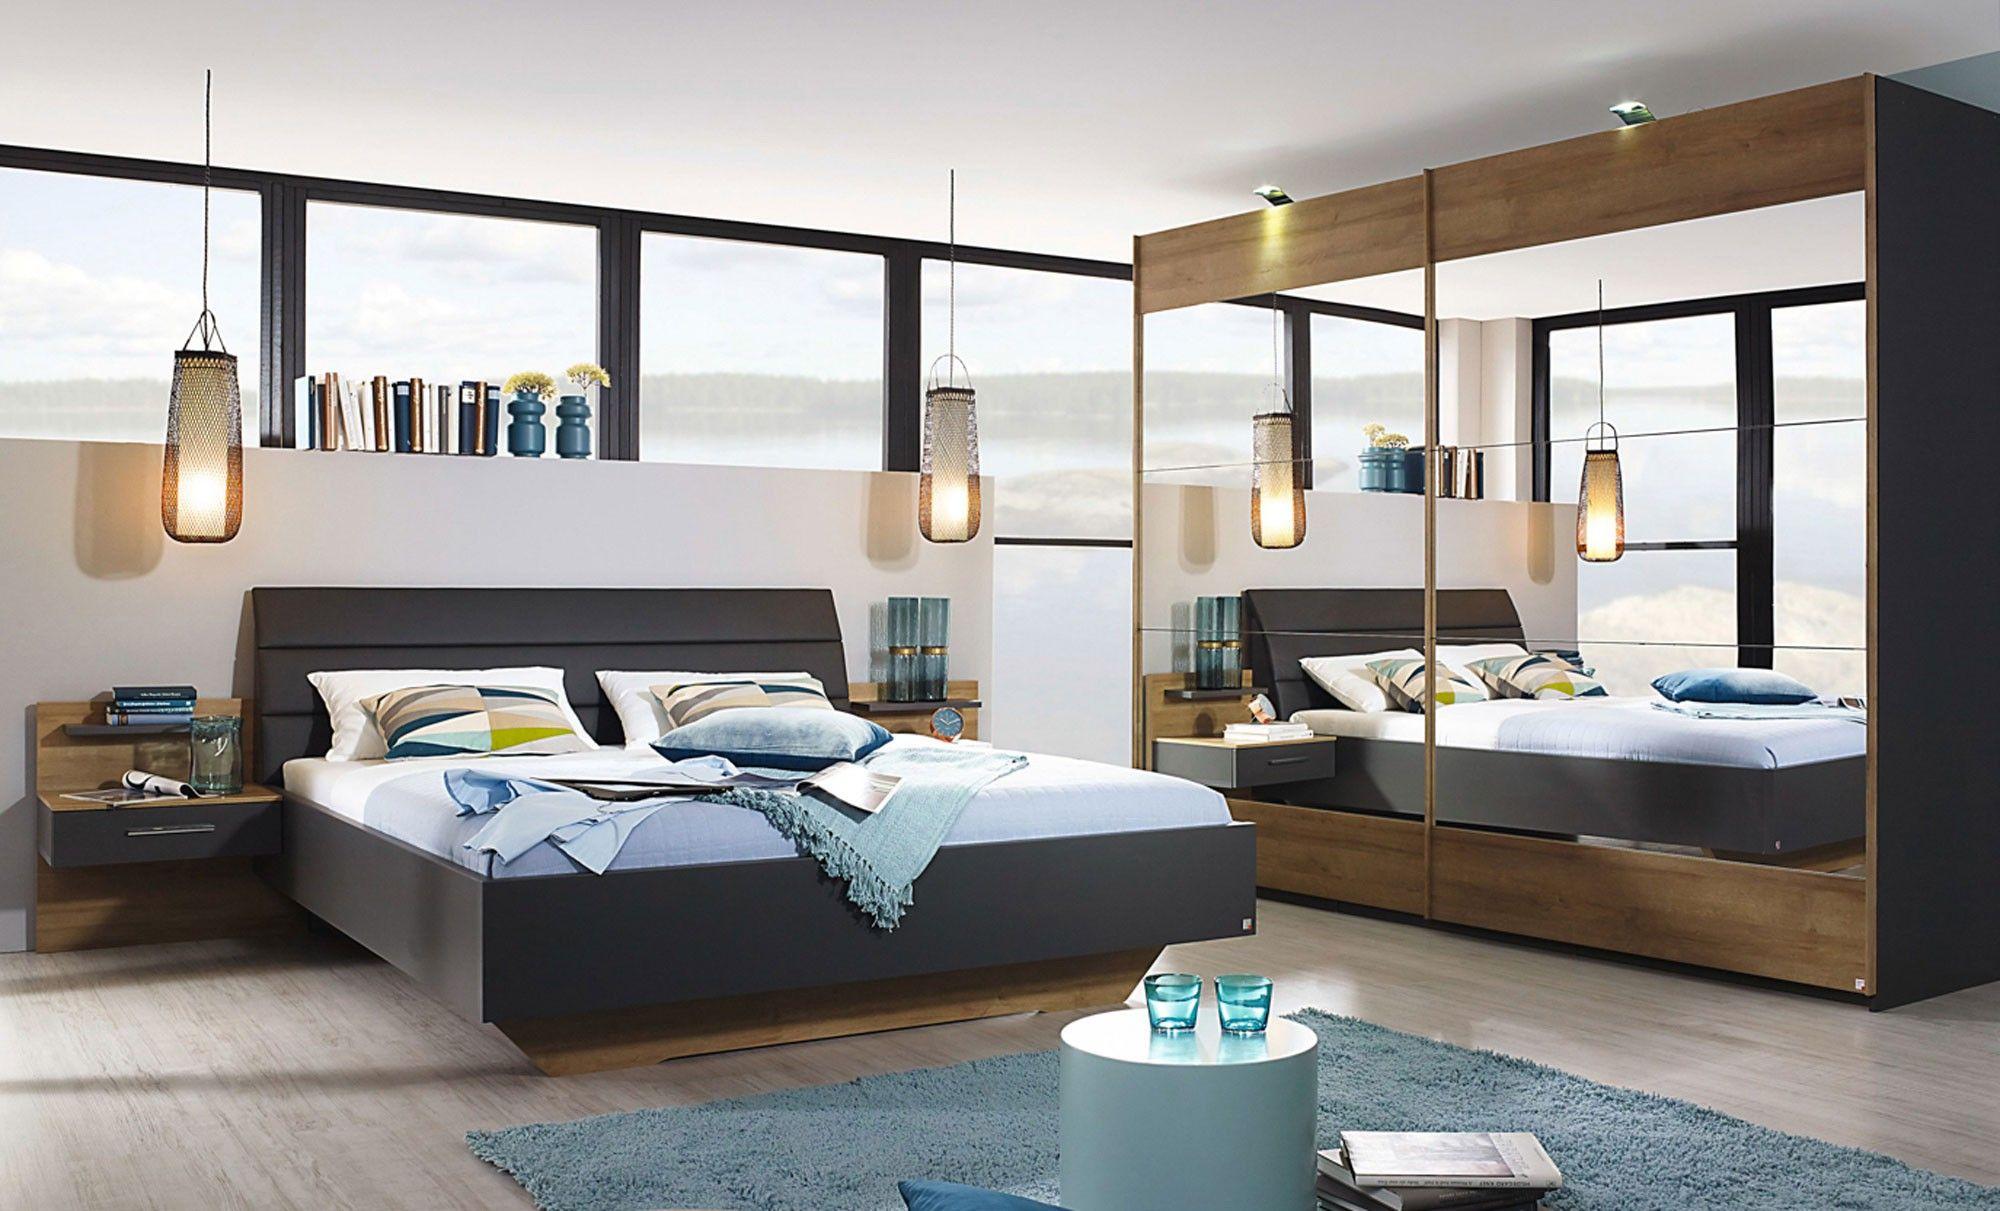 schlafzimmer nora rauch moebelwerke optiwohnwelt wohntrend2018 dunkle holzm bel. Black Bedroom Furniture Sets. Home Design Ideas